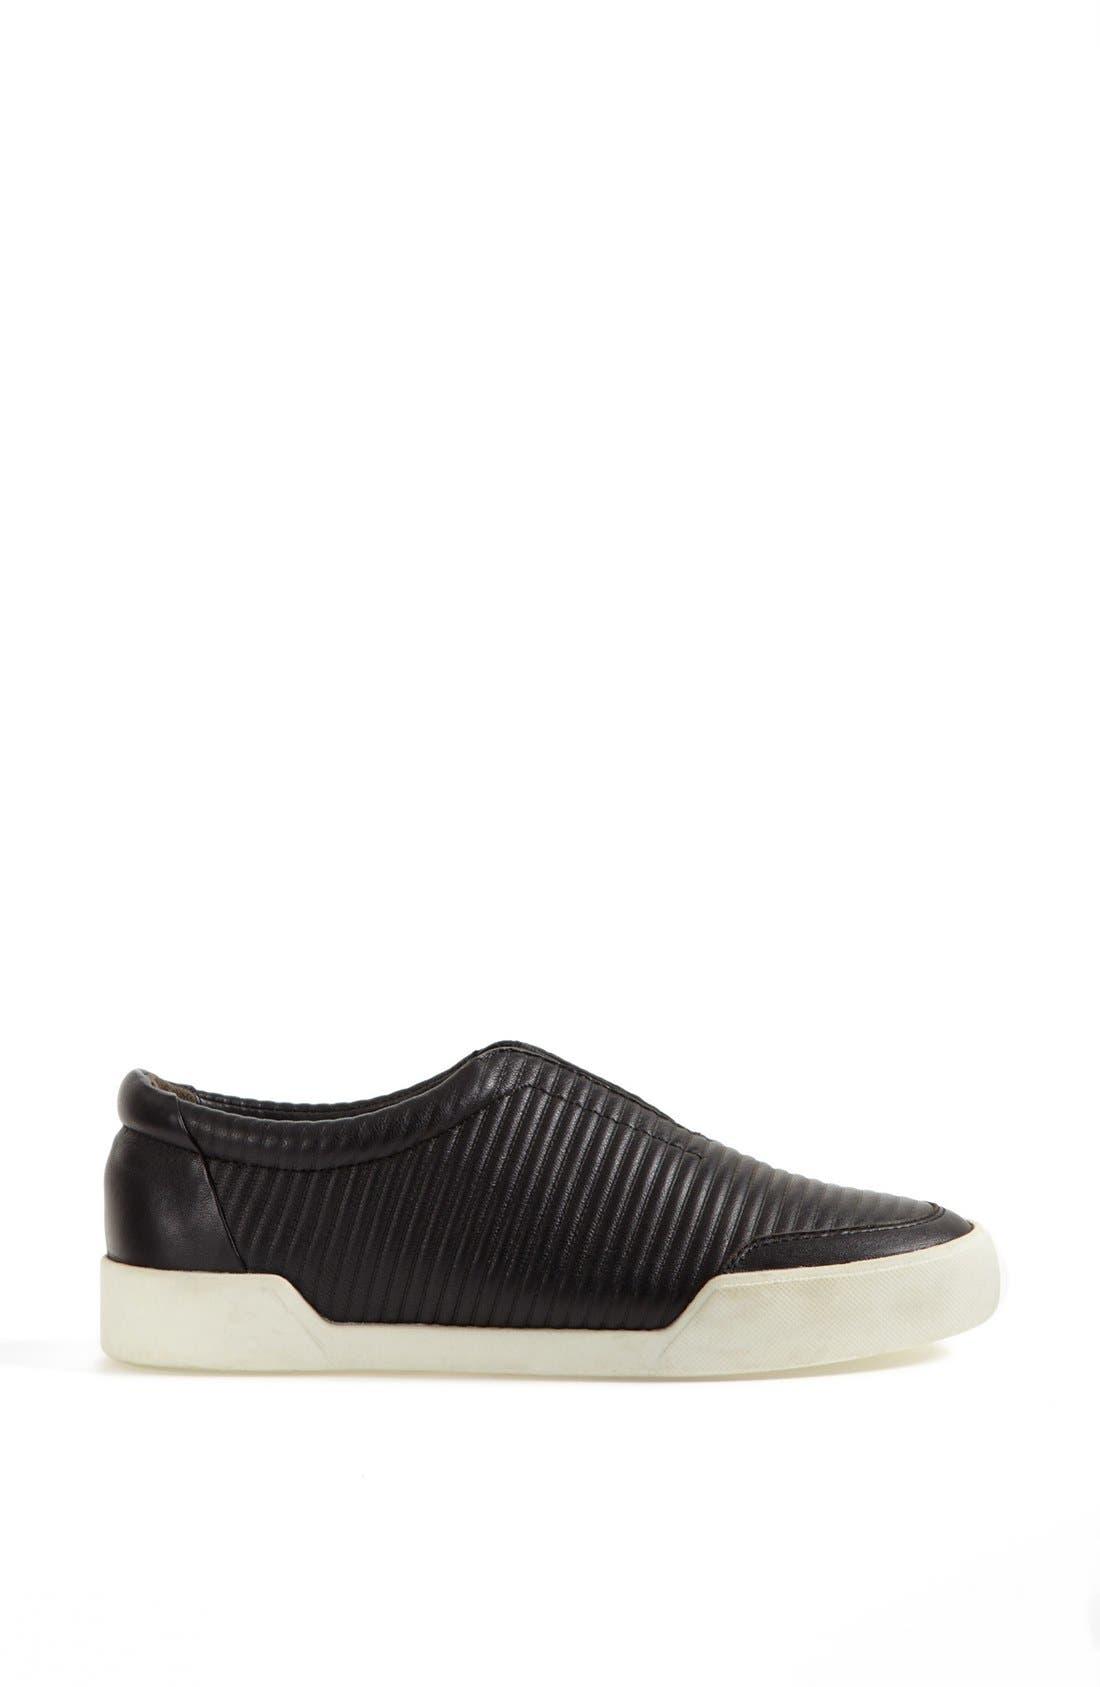 'Morgan' Slip-On Sneaker,                             Alternate thumbnail 4, color,                             Black